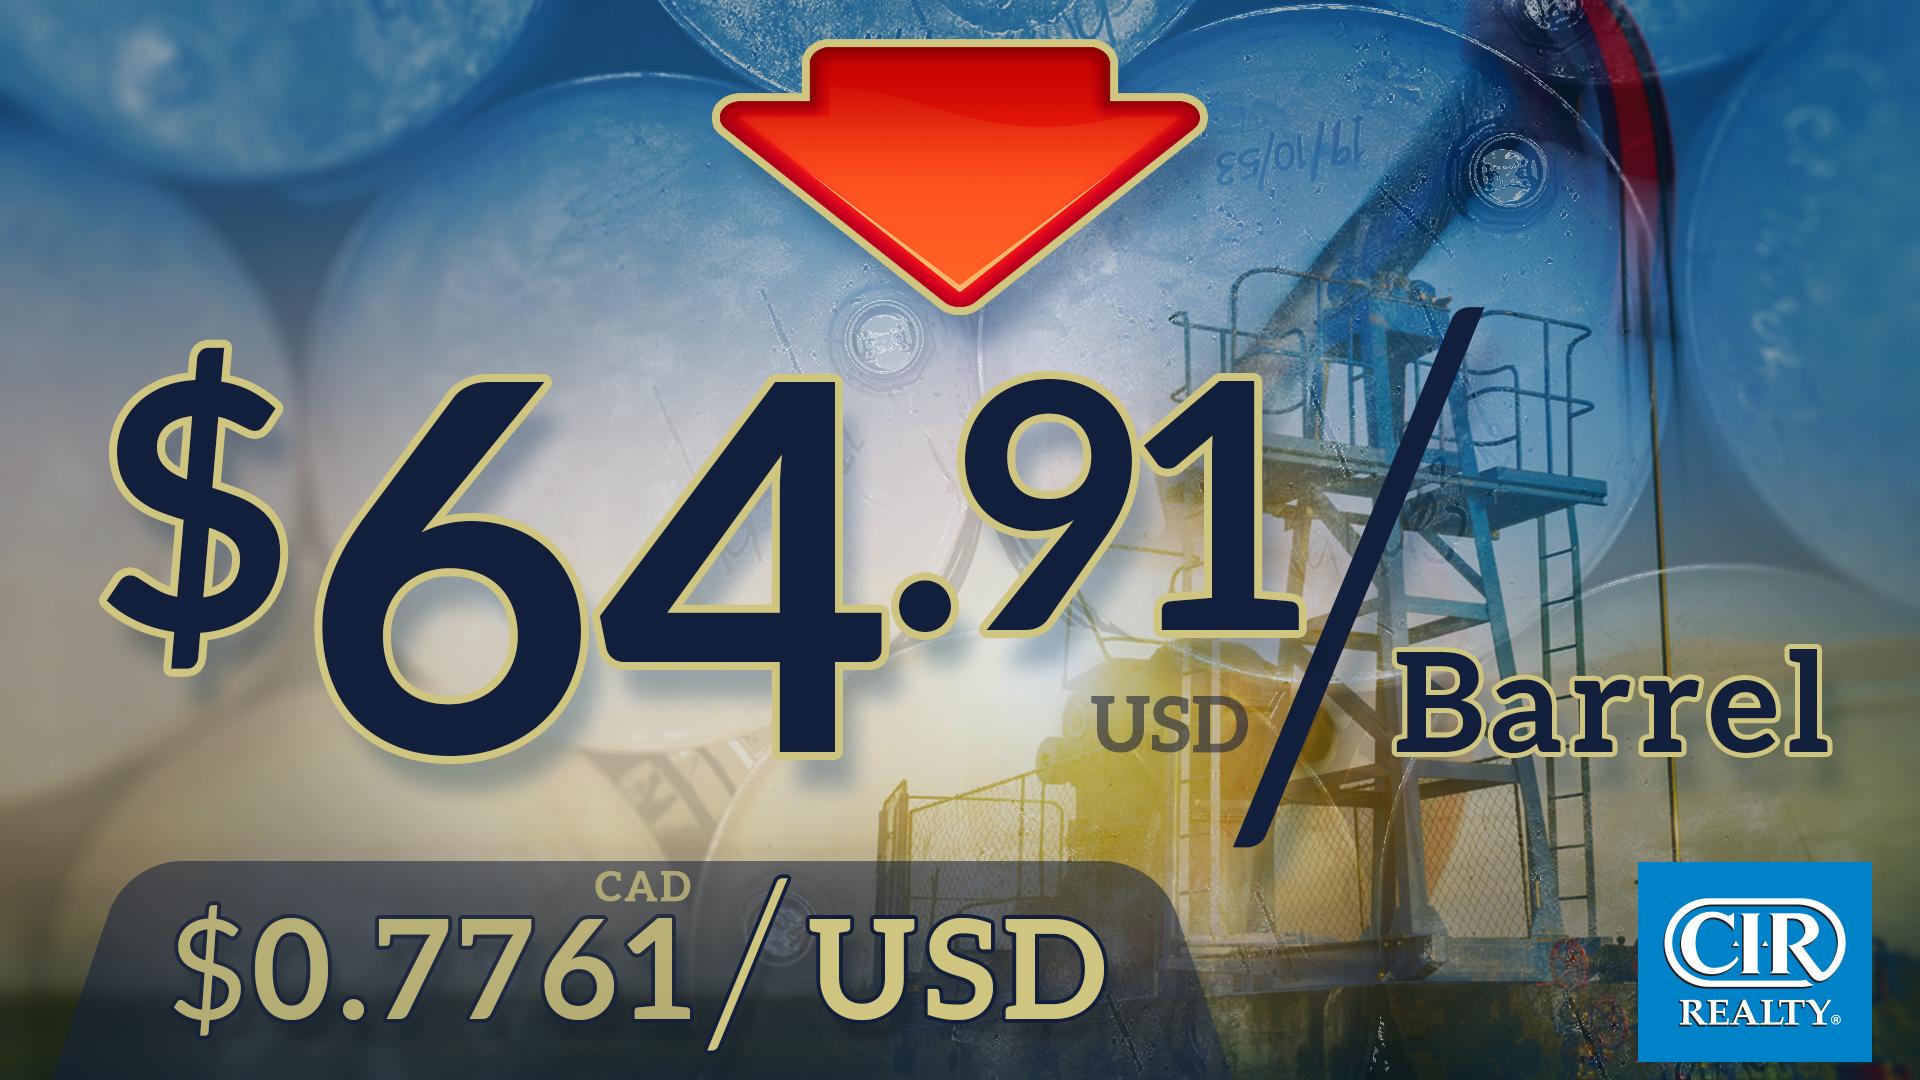 Oil Prices April 2, 2018